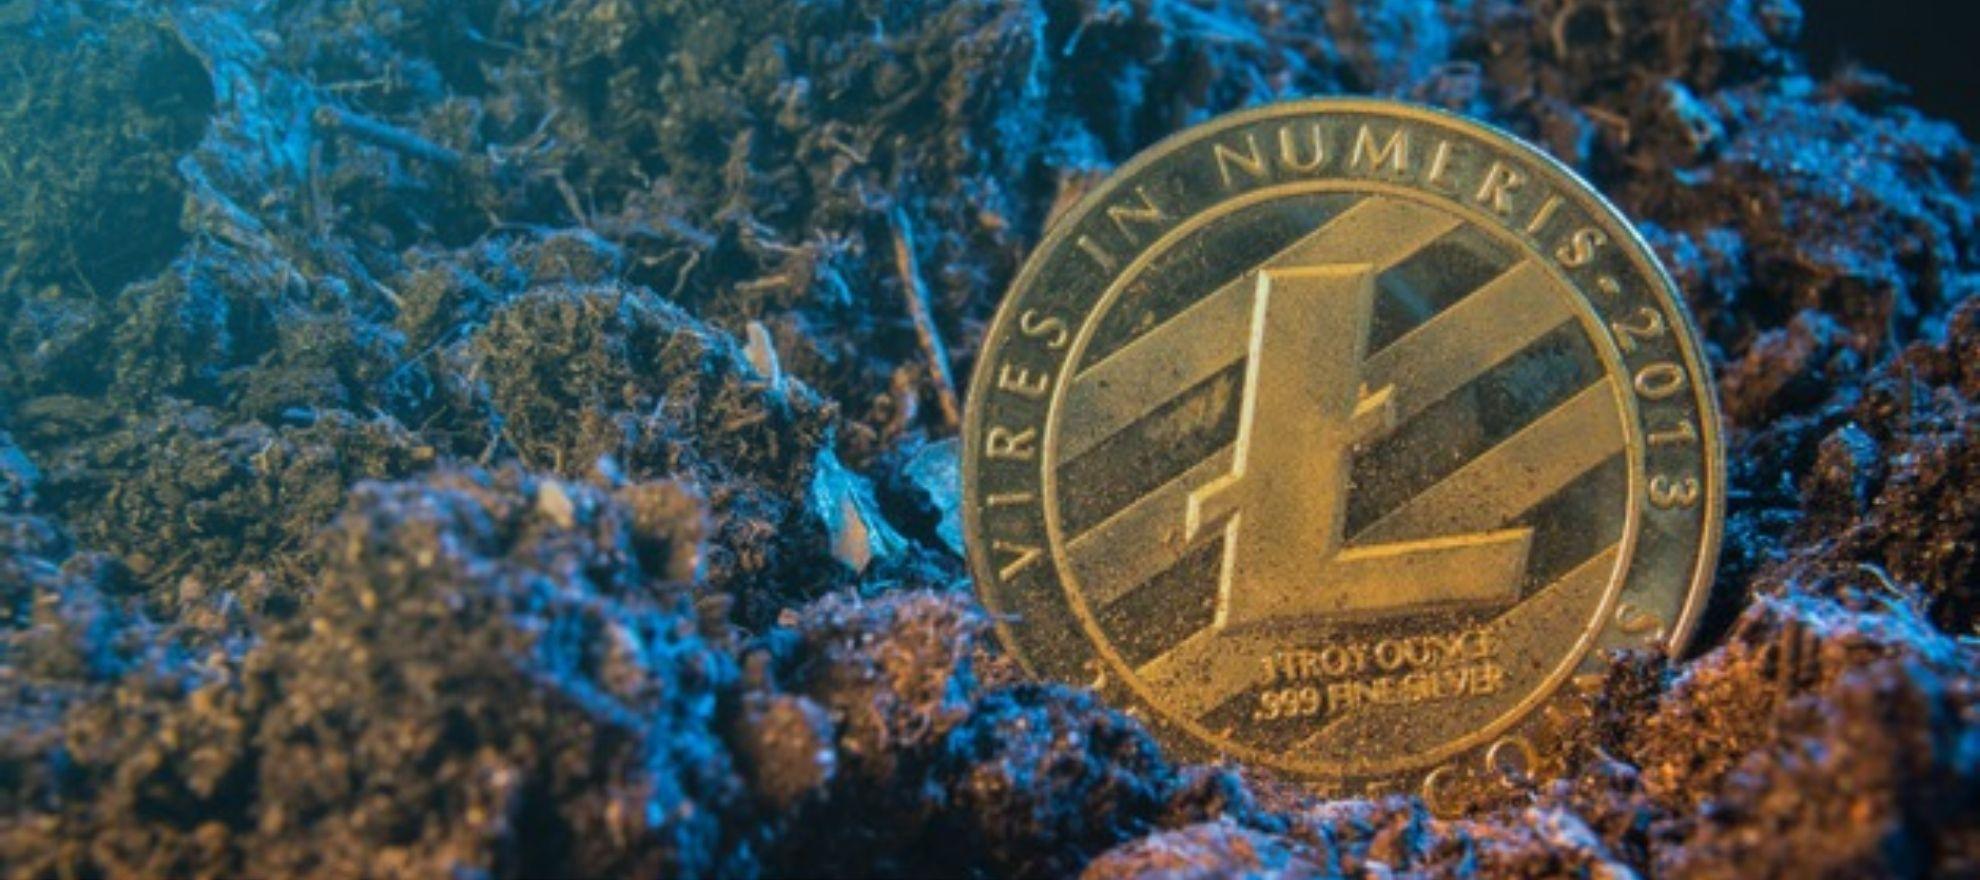 Minerar Litecoin: Veja se é possível e se vale a pena